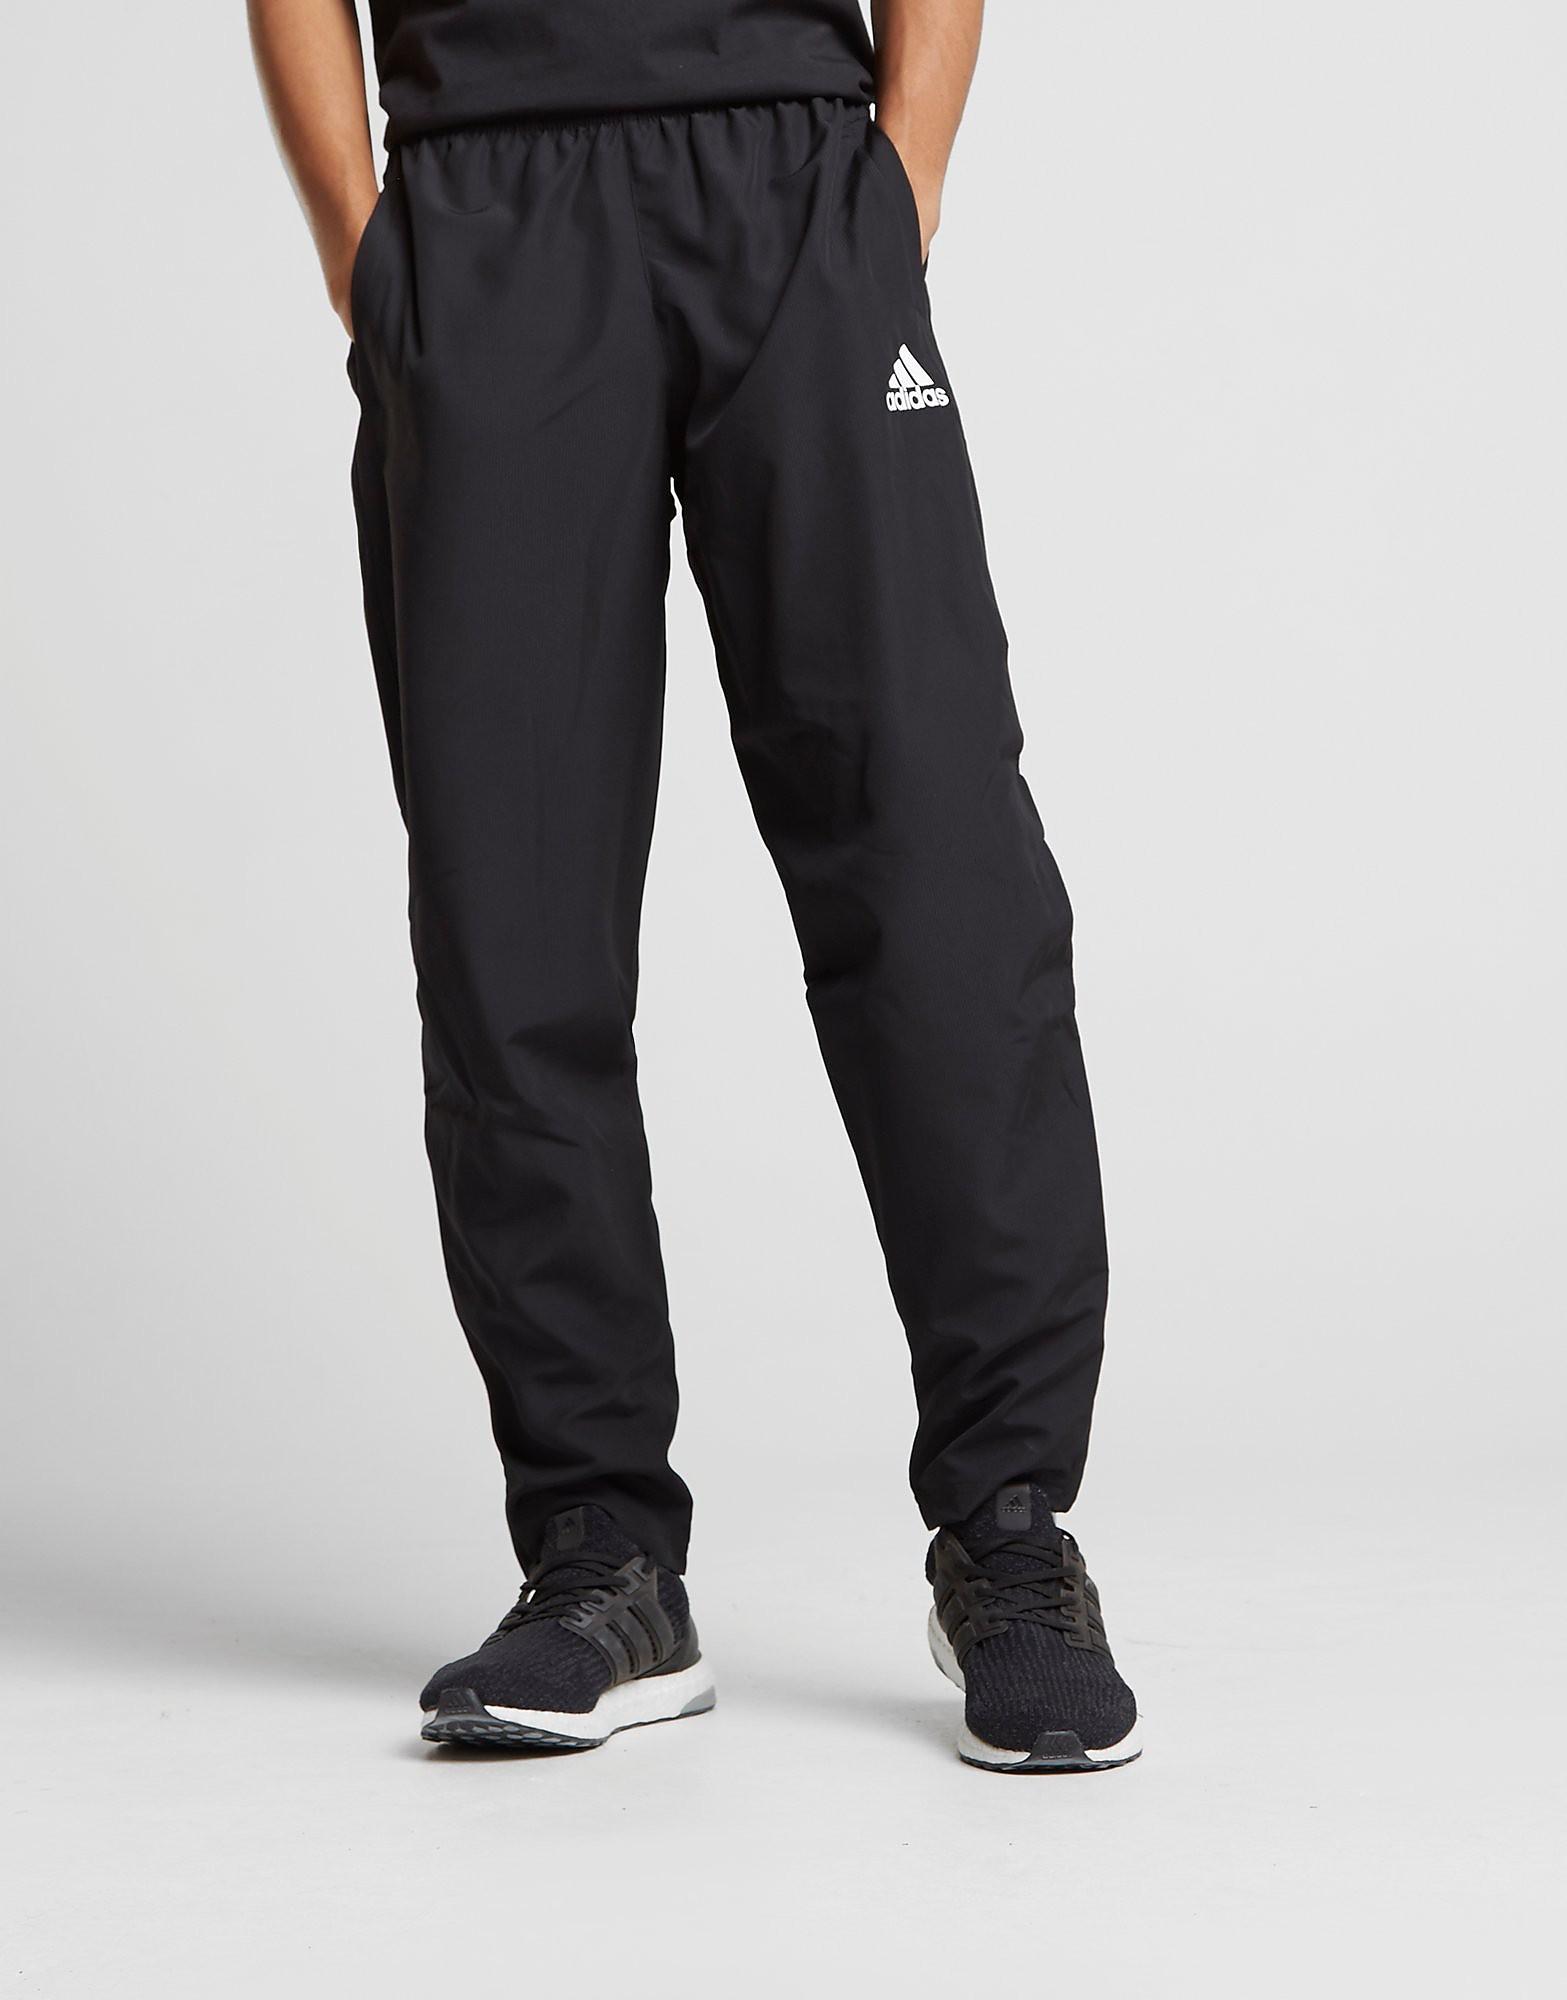 adidas Tiro 17 Woven Pants